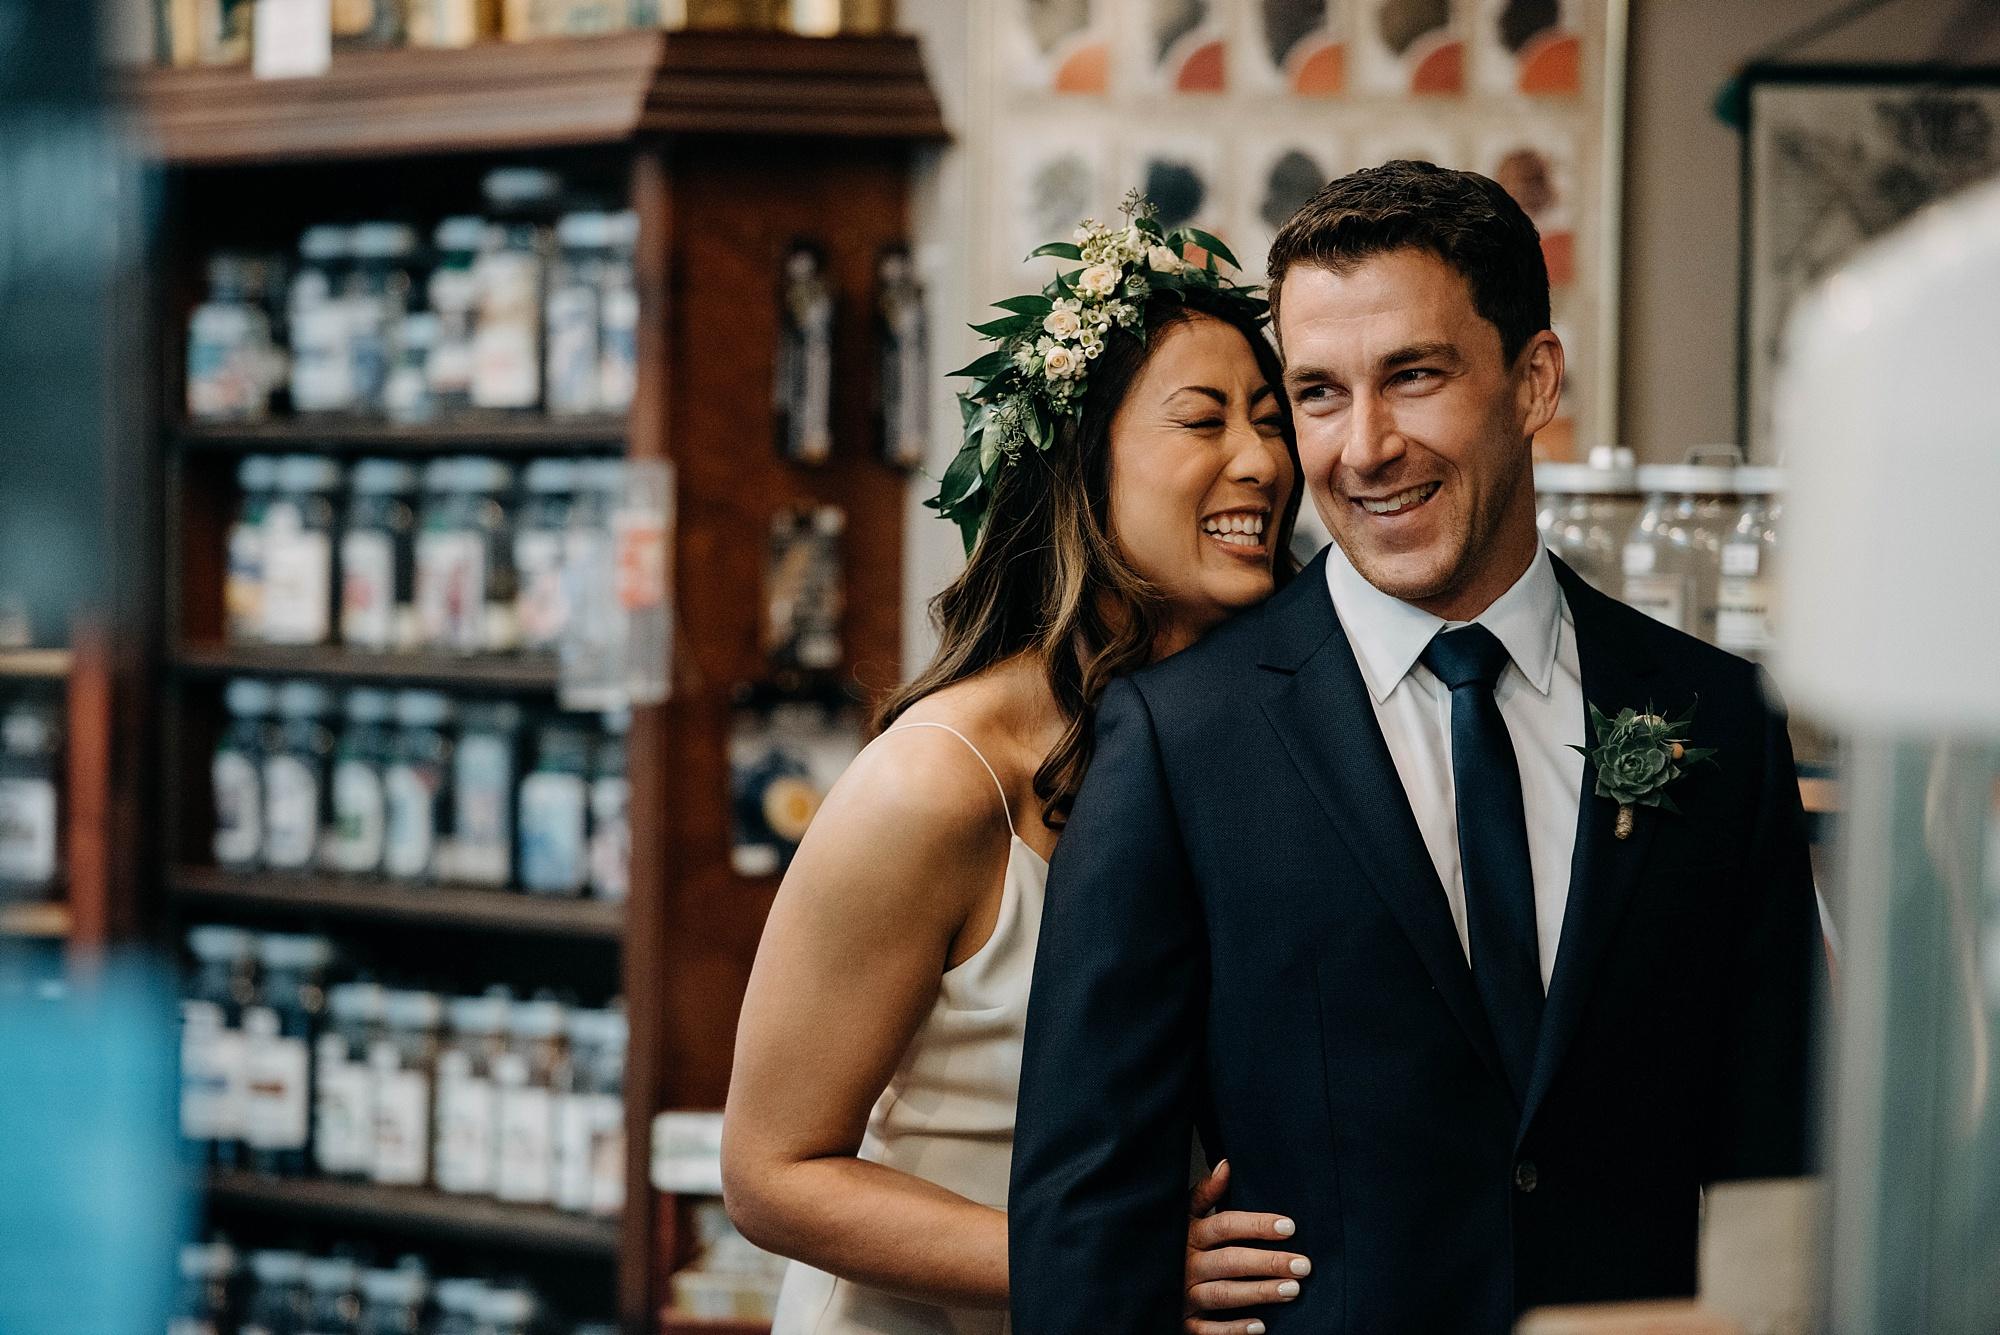 first look between bride and groom in downtown calgary wedding